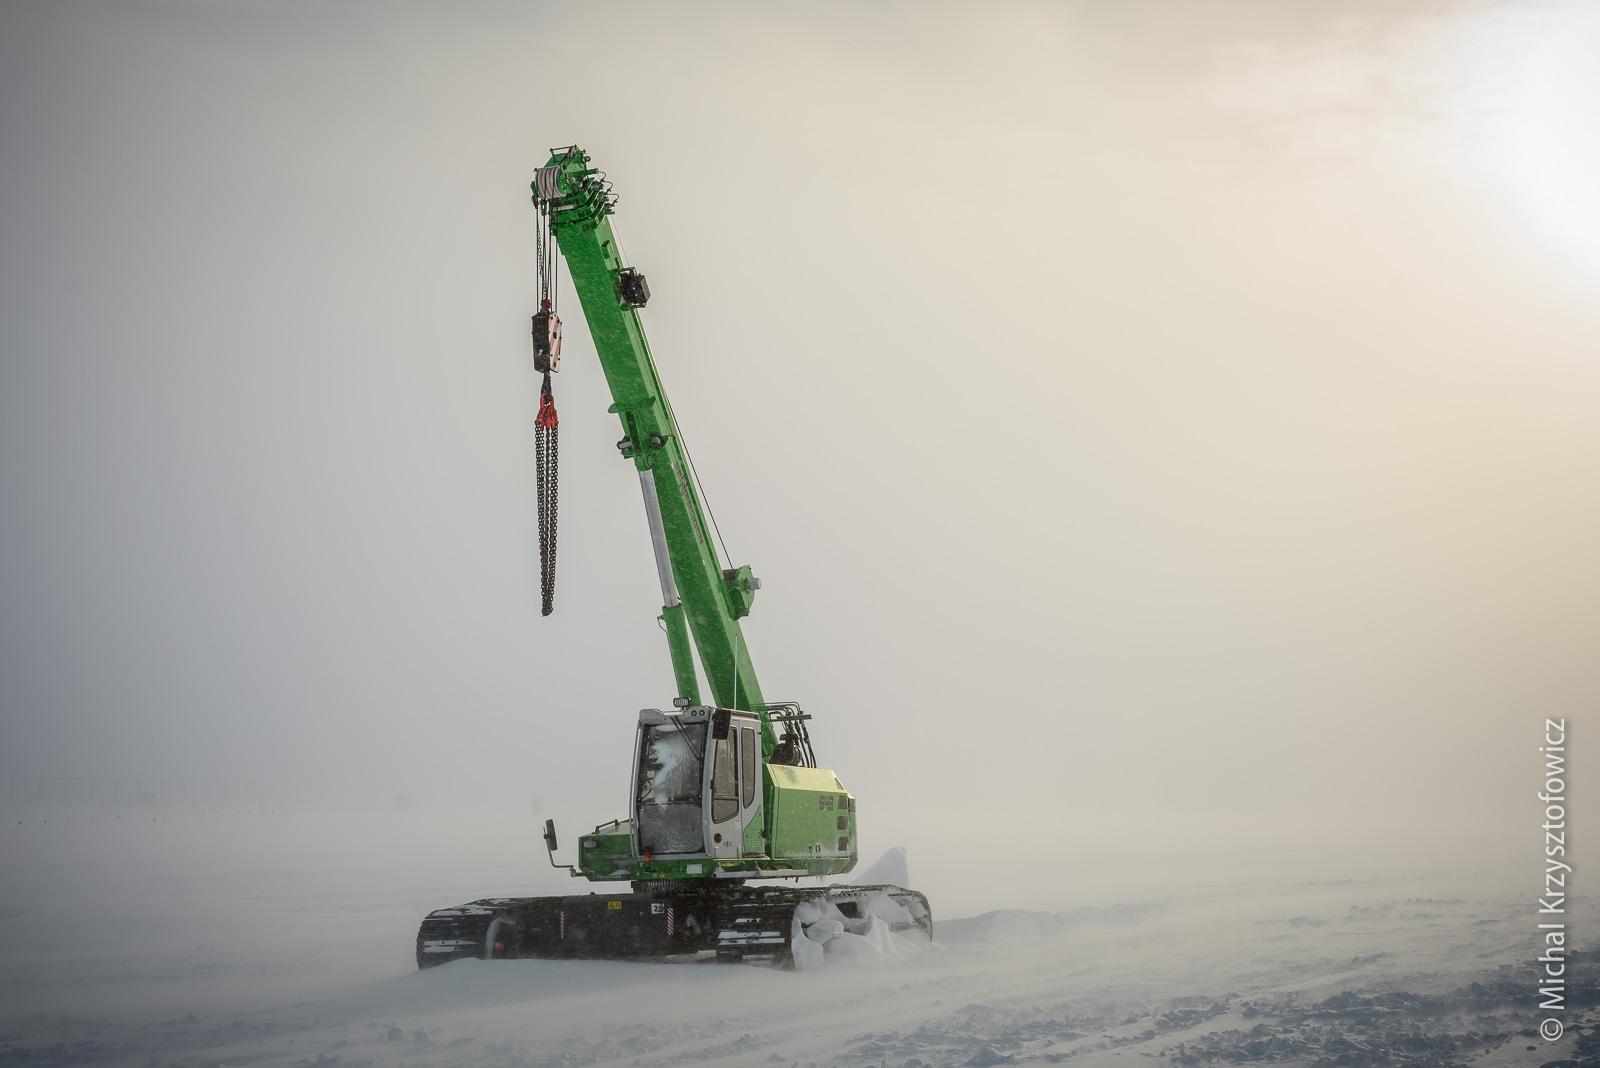 Sennebogen 643R telescopic crawler crane south pole